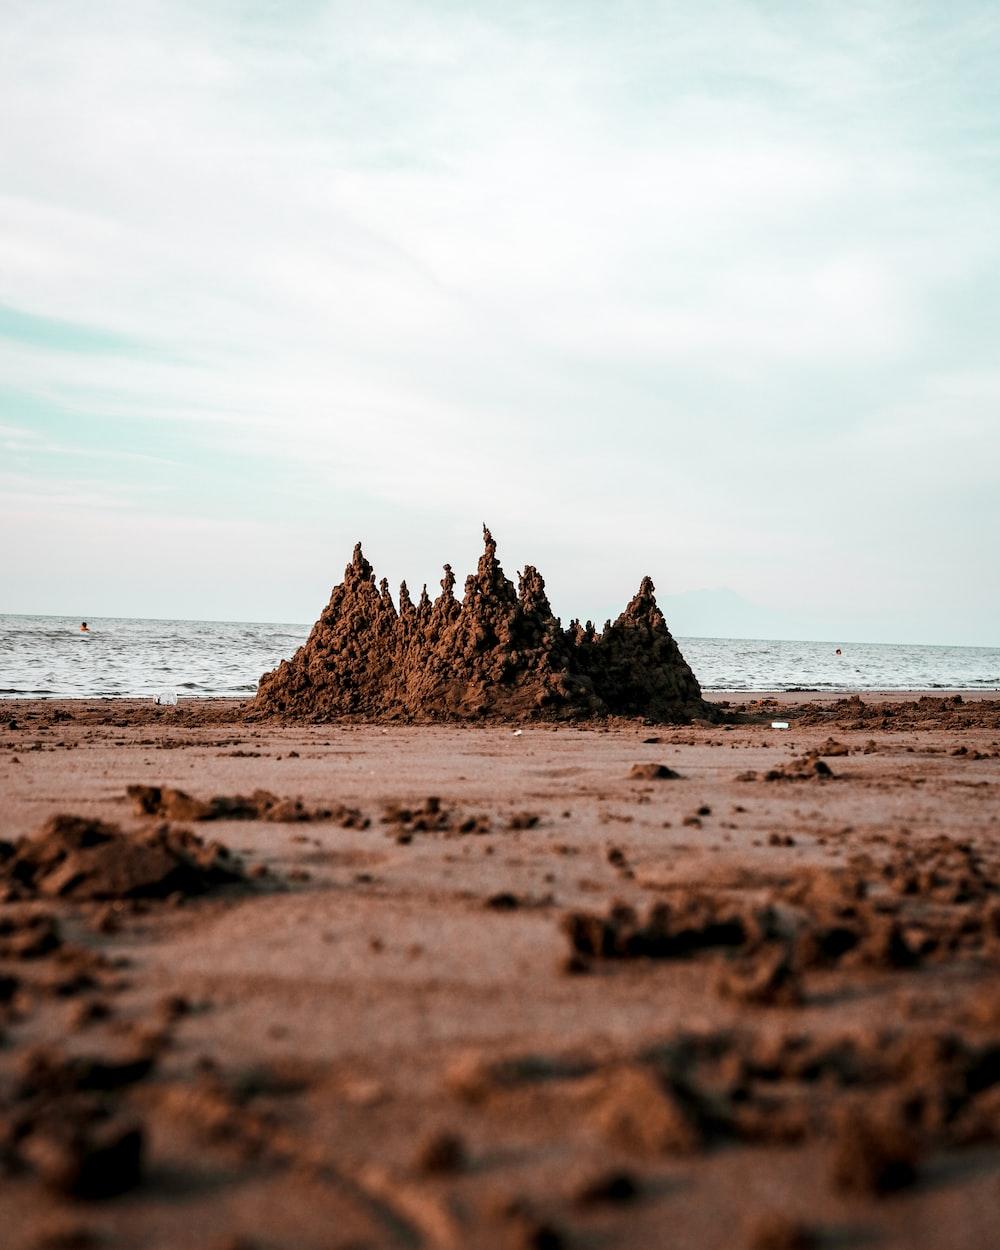 sand castle on seashore during daytime